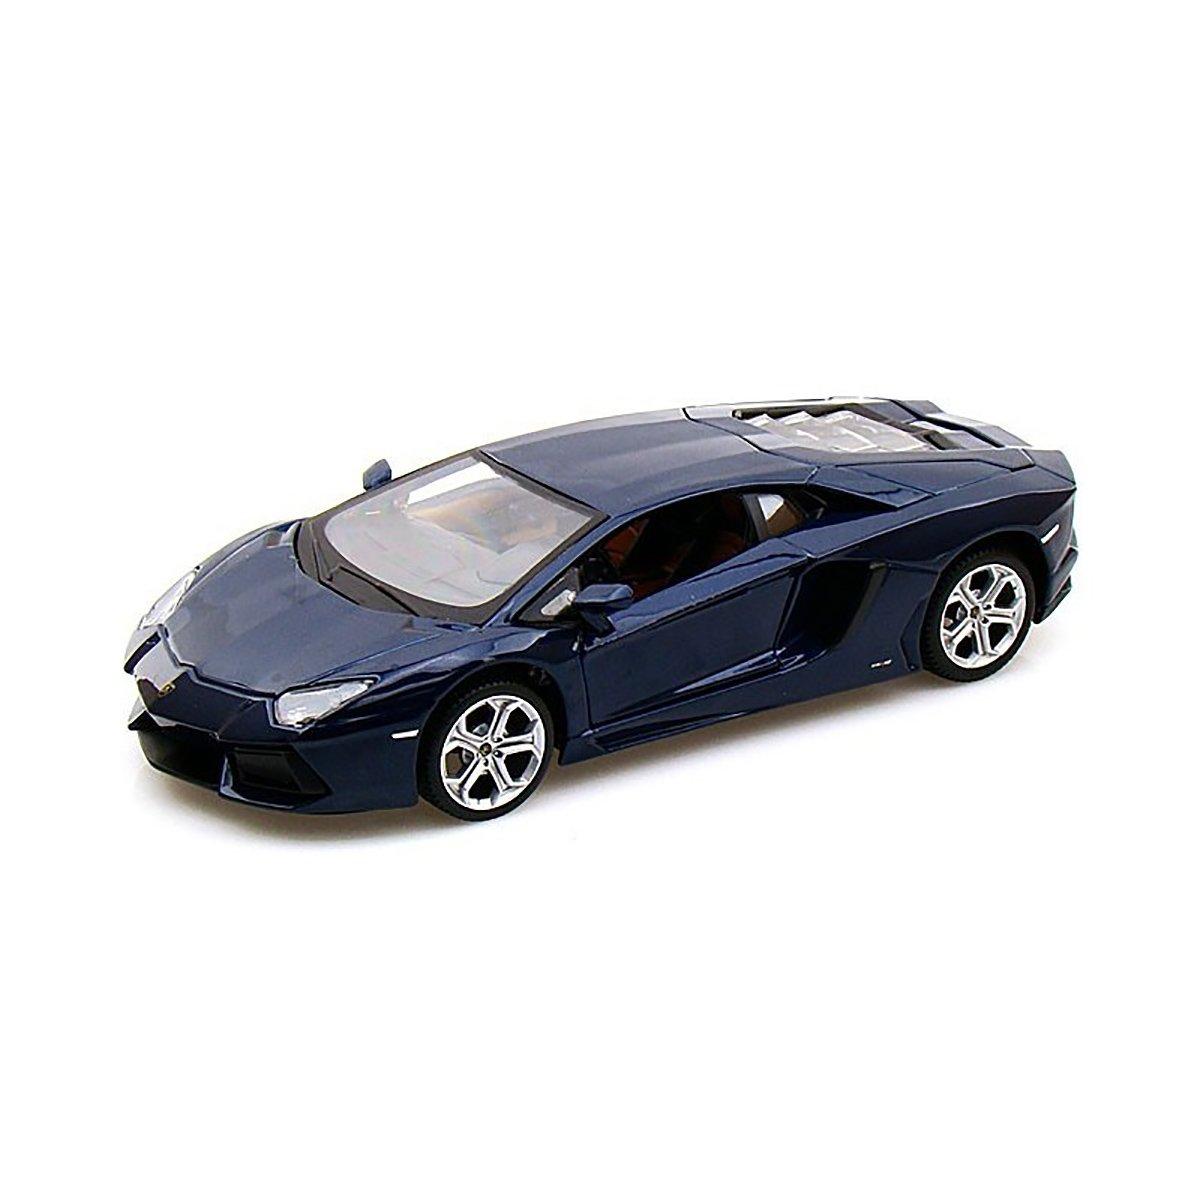 Masinuta Maisto Lamborghini Aventador LP 700 4, 1:24